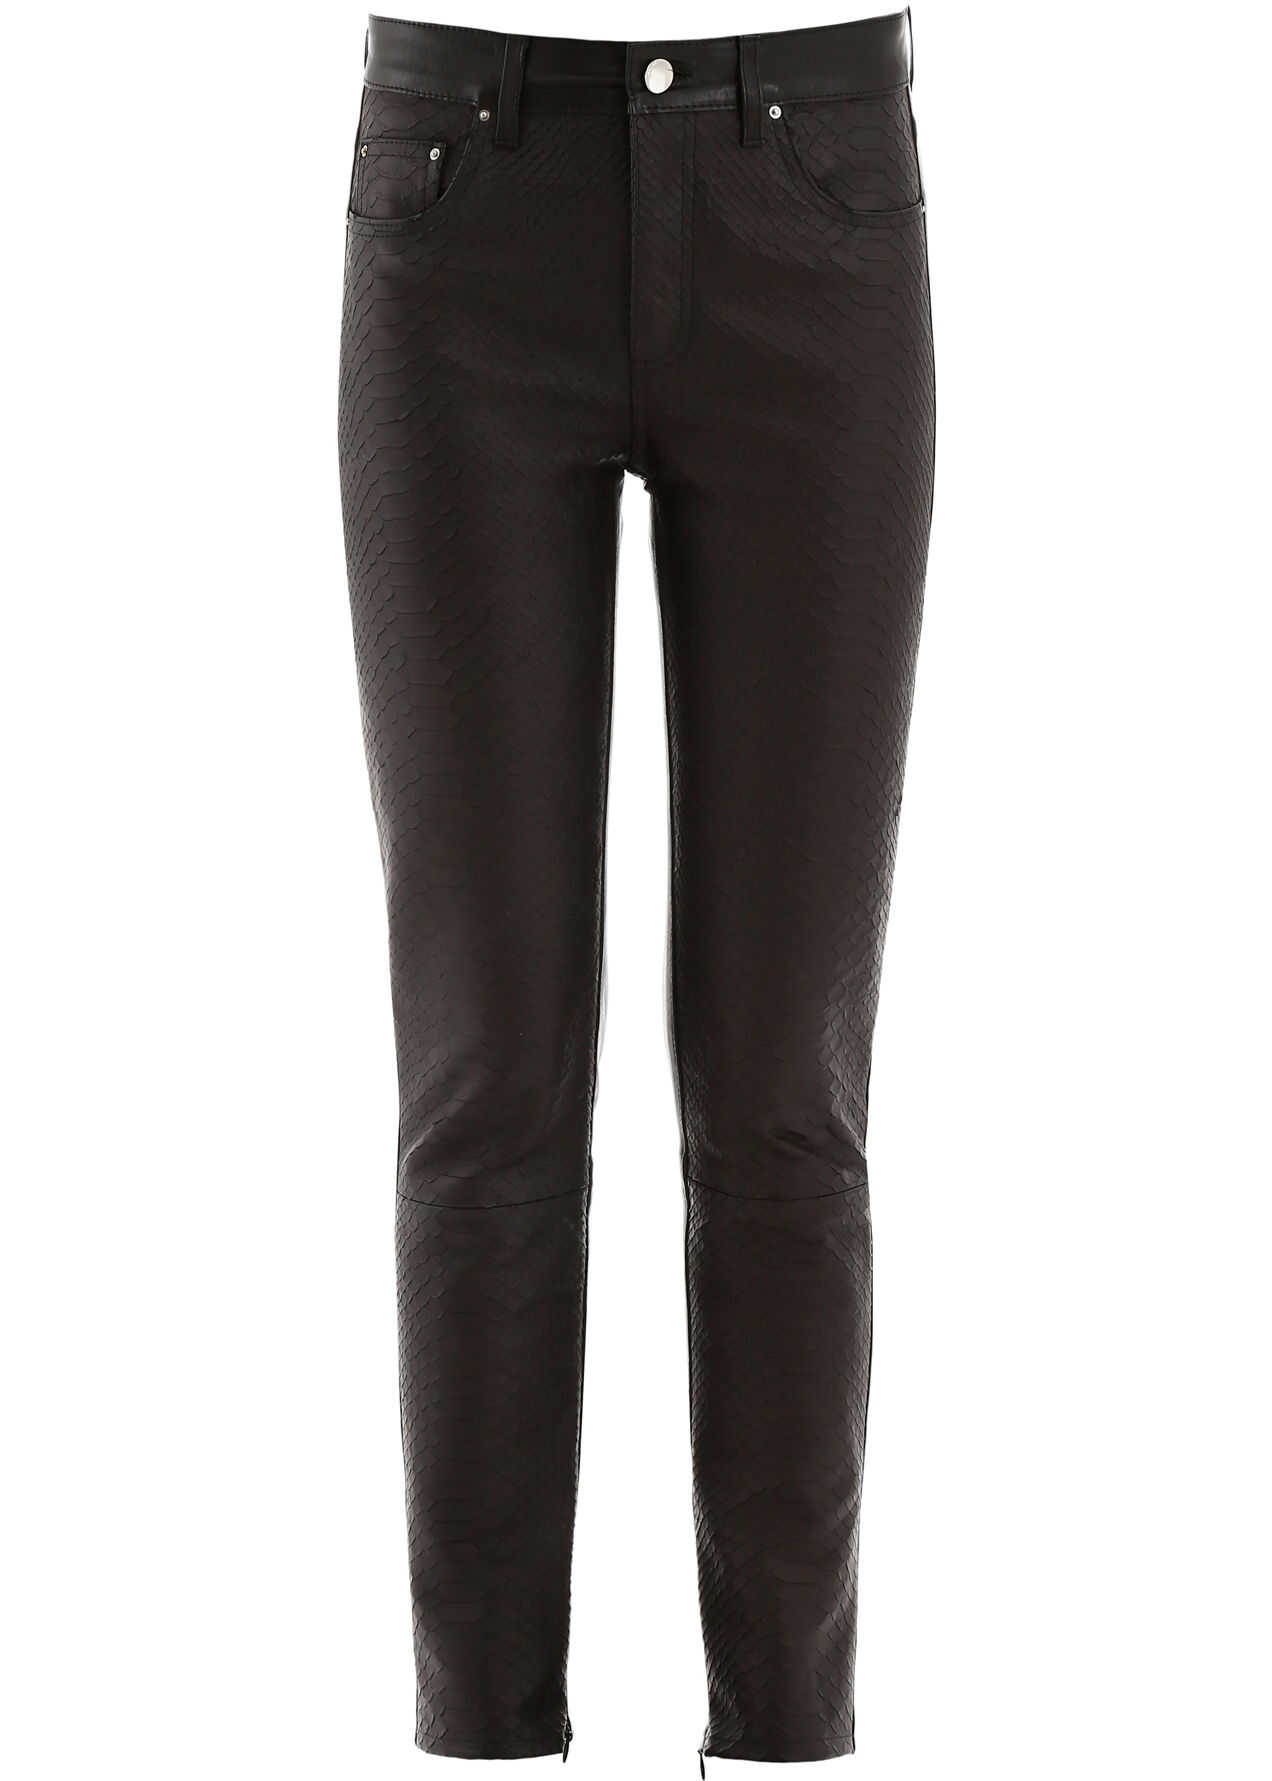 AMIRI Python Print Leather Trousers BLACK